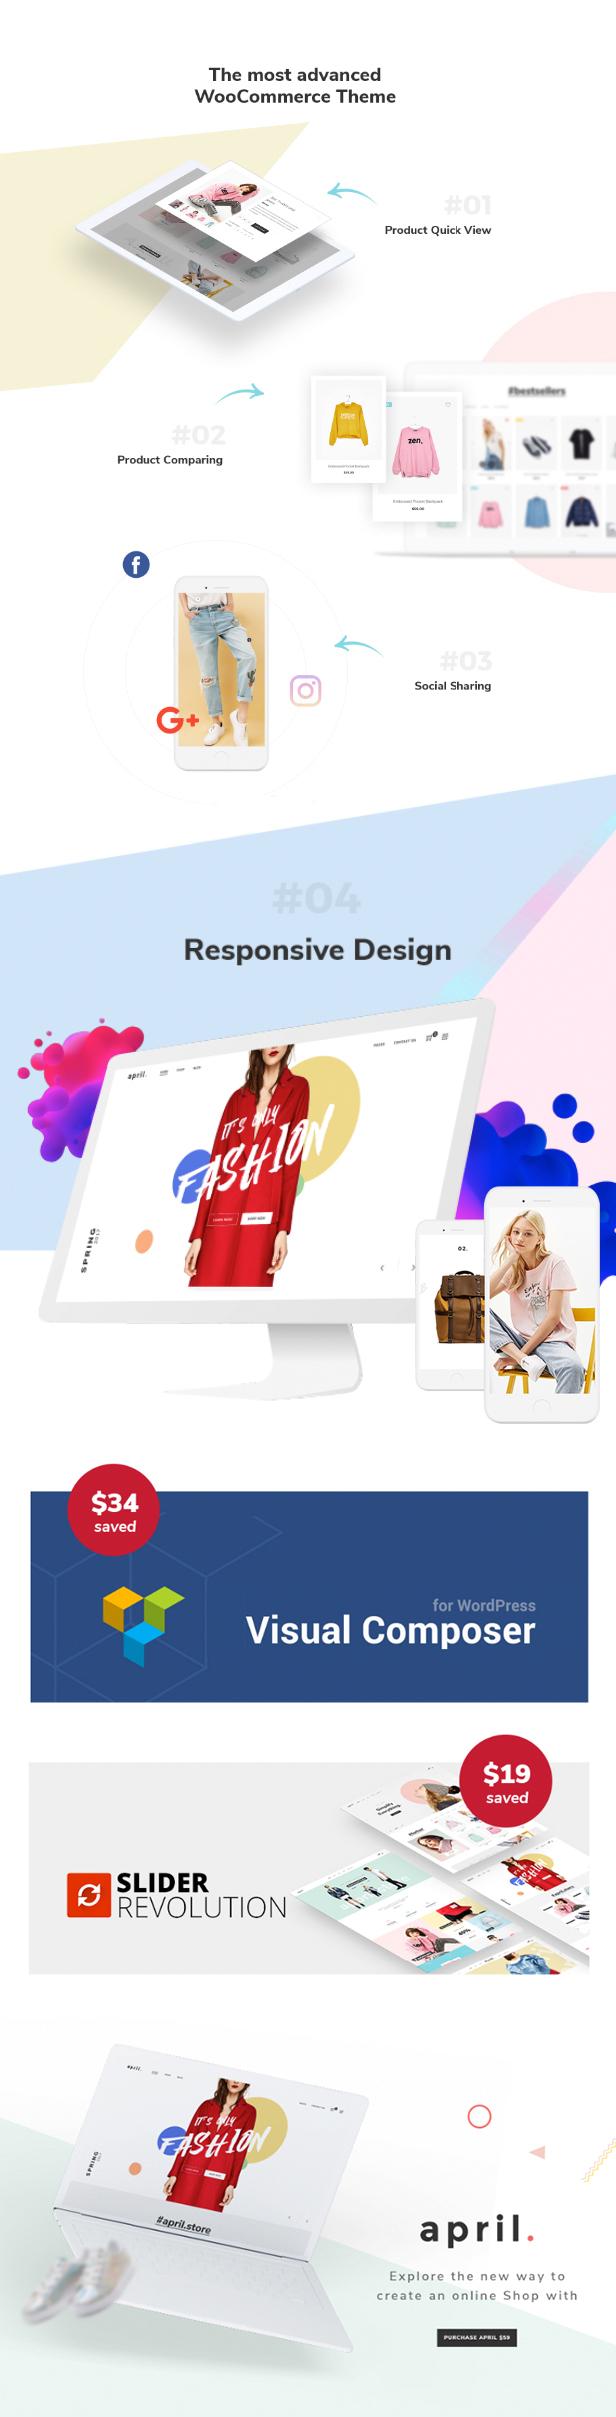 APRIL - Wunderbare Mode WooCommerce WordPress Vorlage - 24